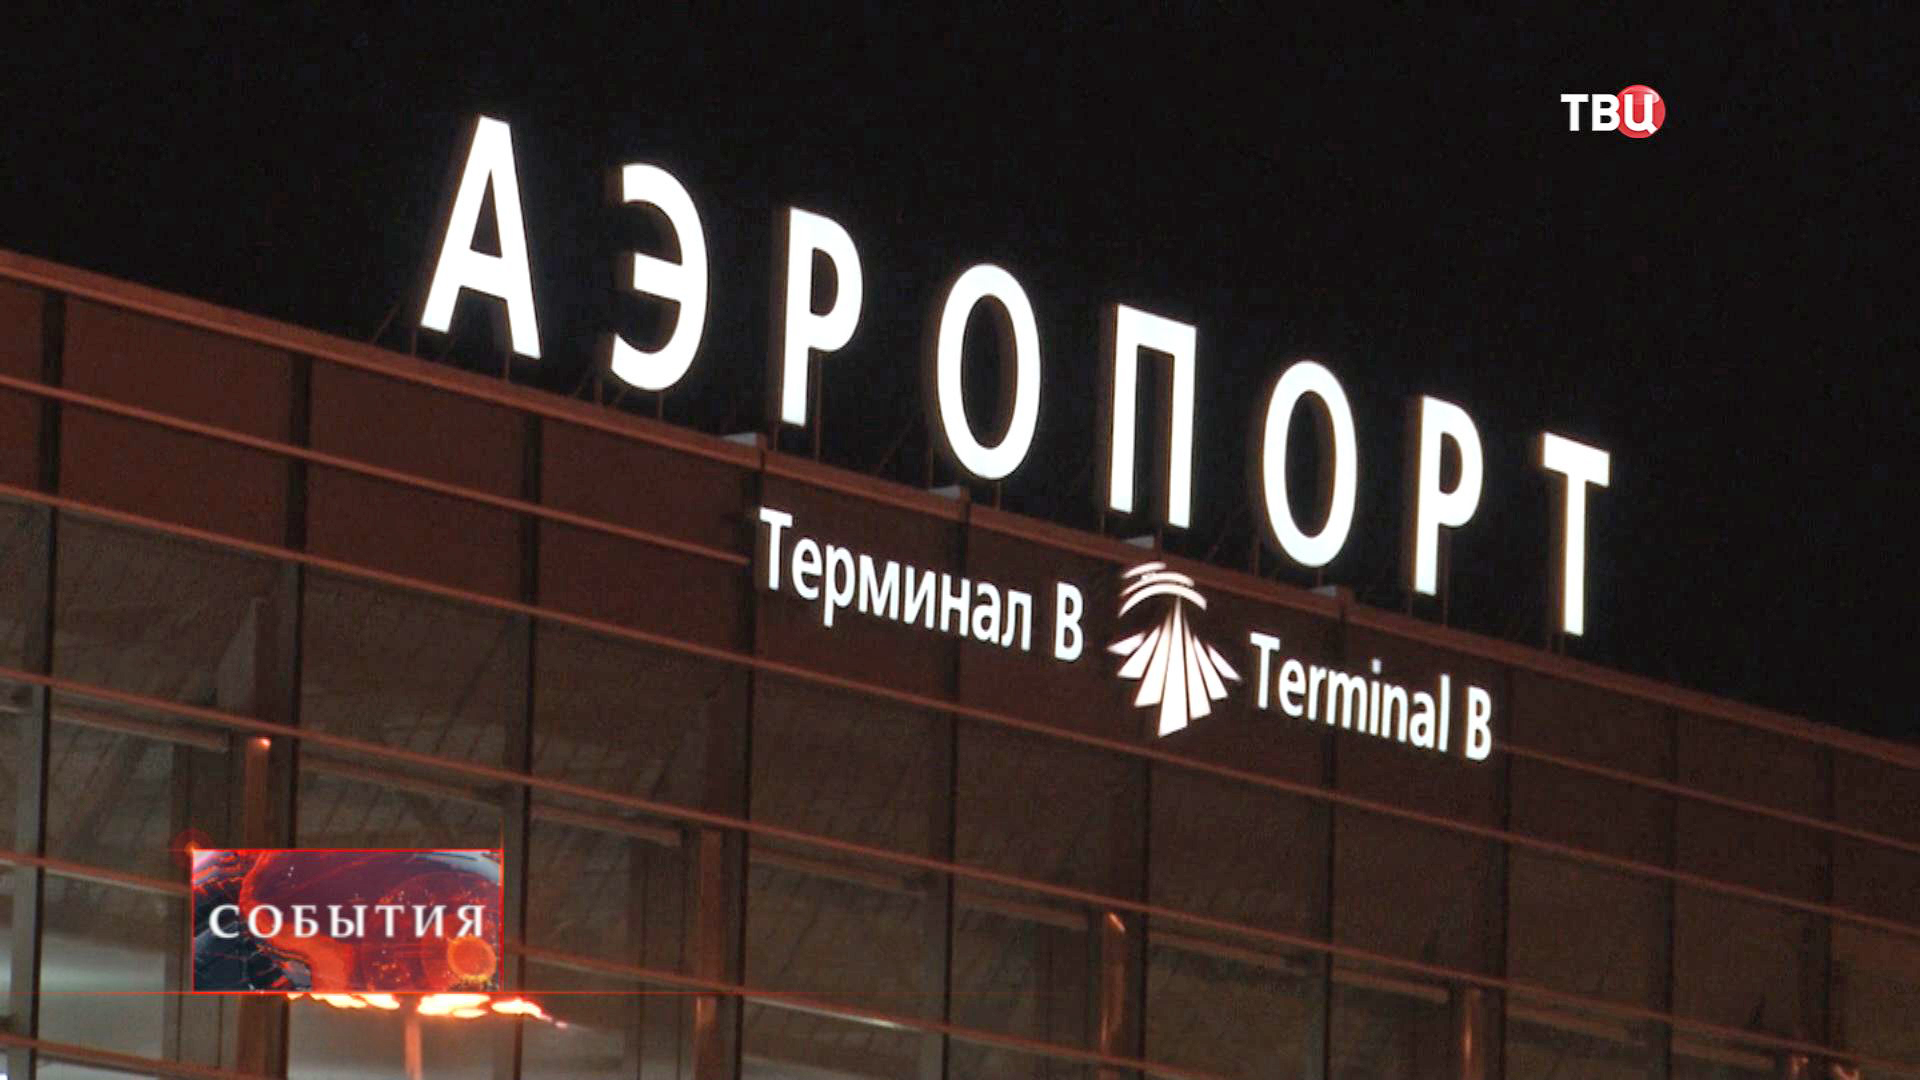 Аэропорт в Екатеренбурге